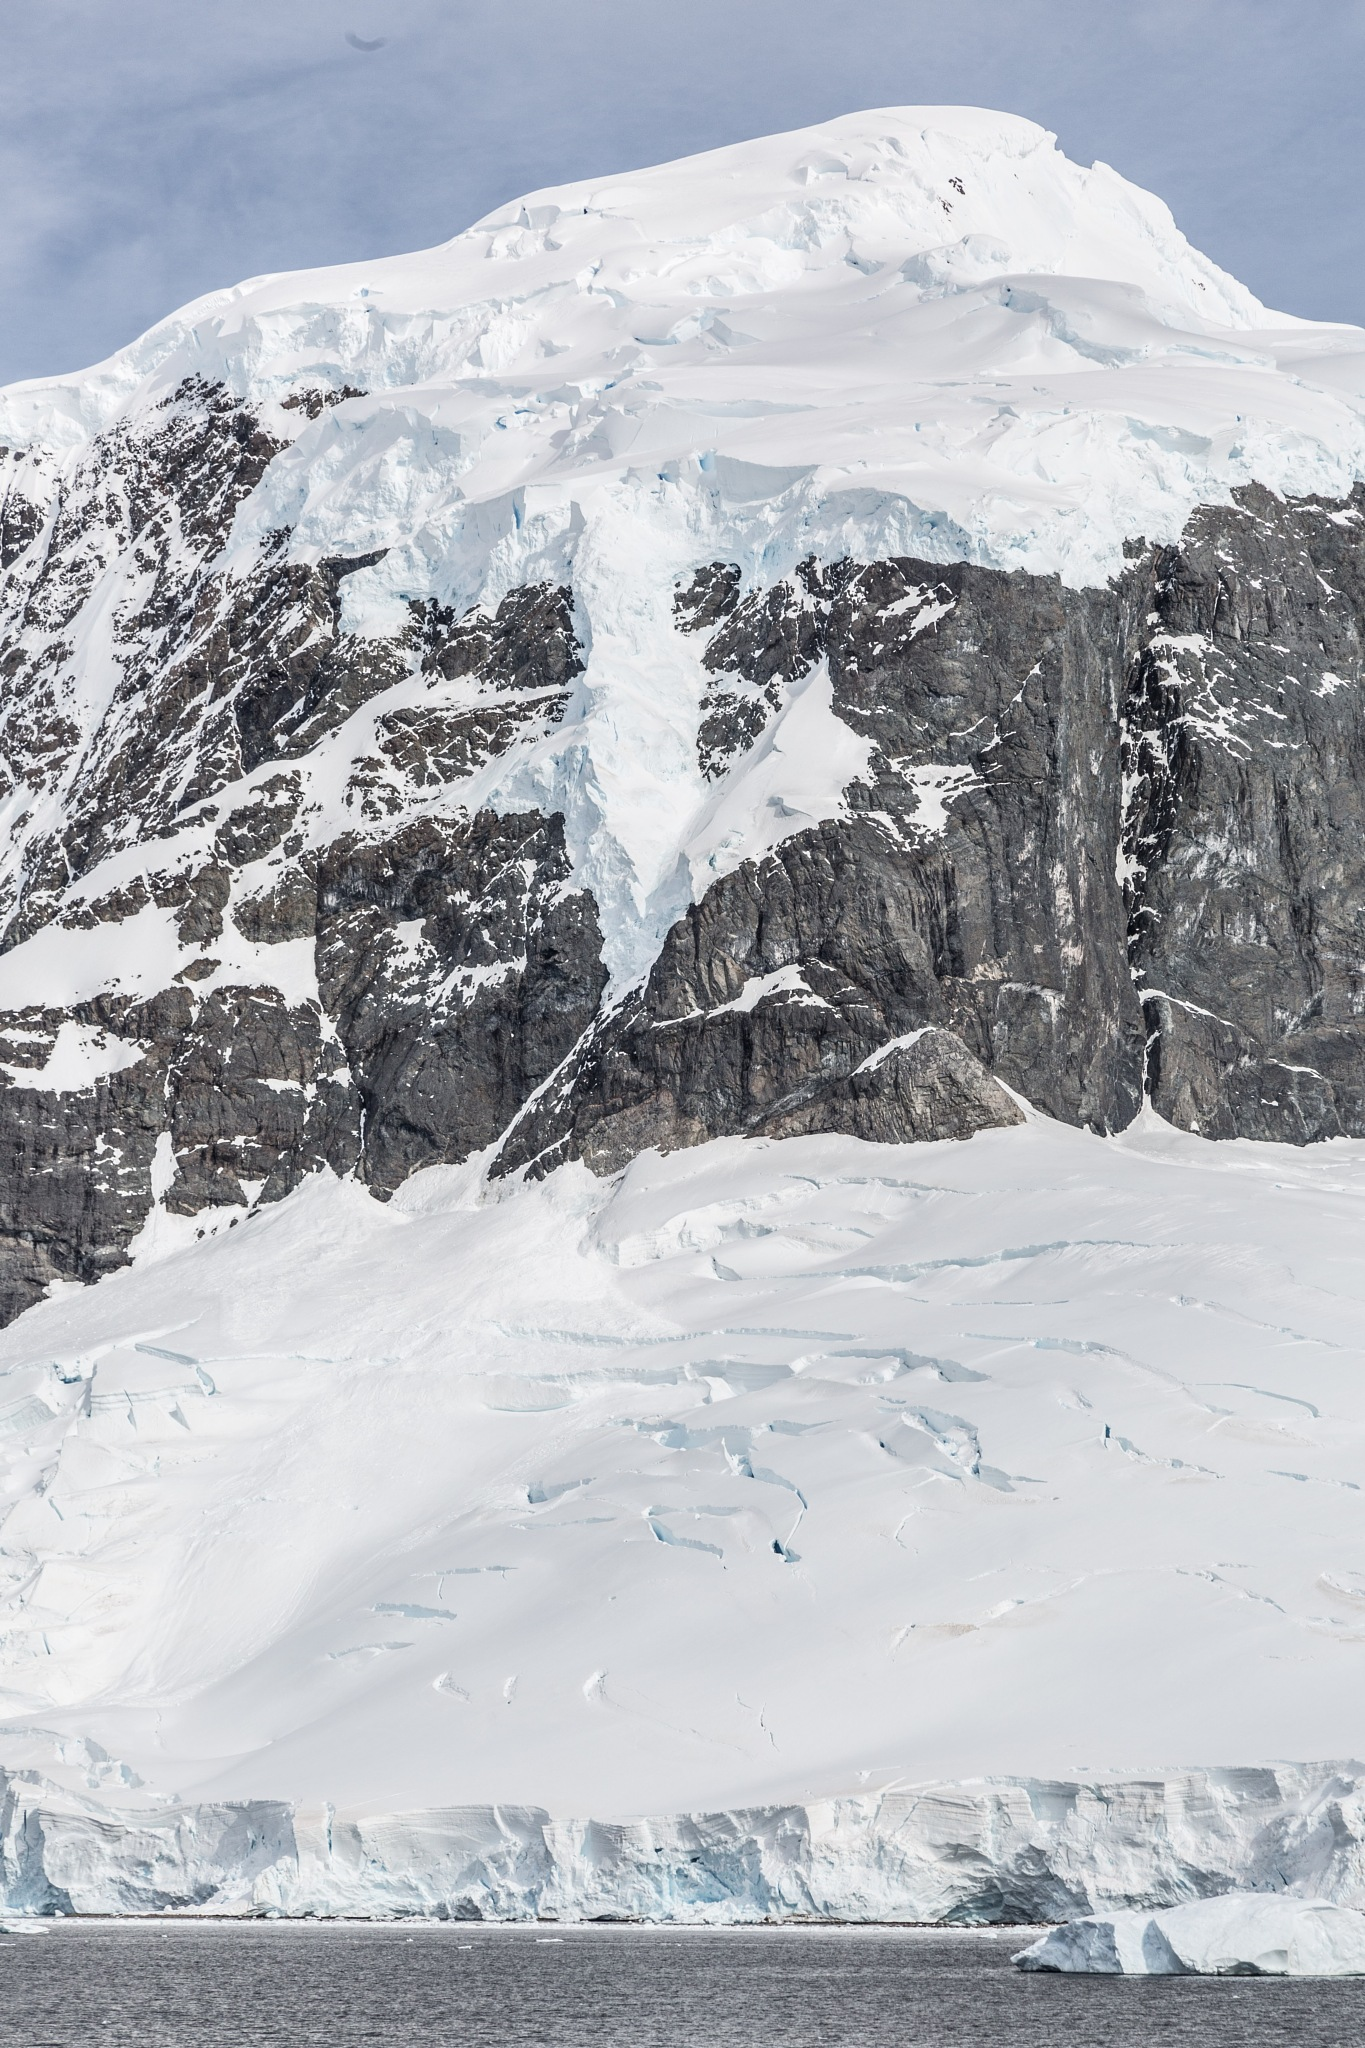 Snow, Ice & Rock by Robert White